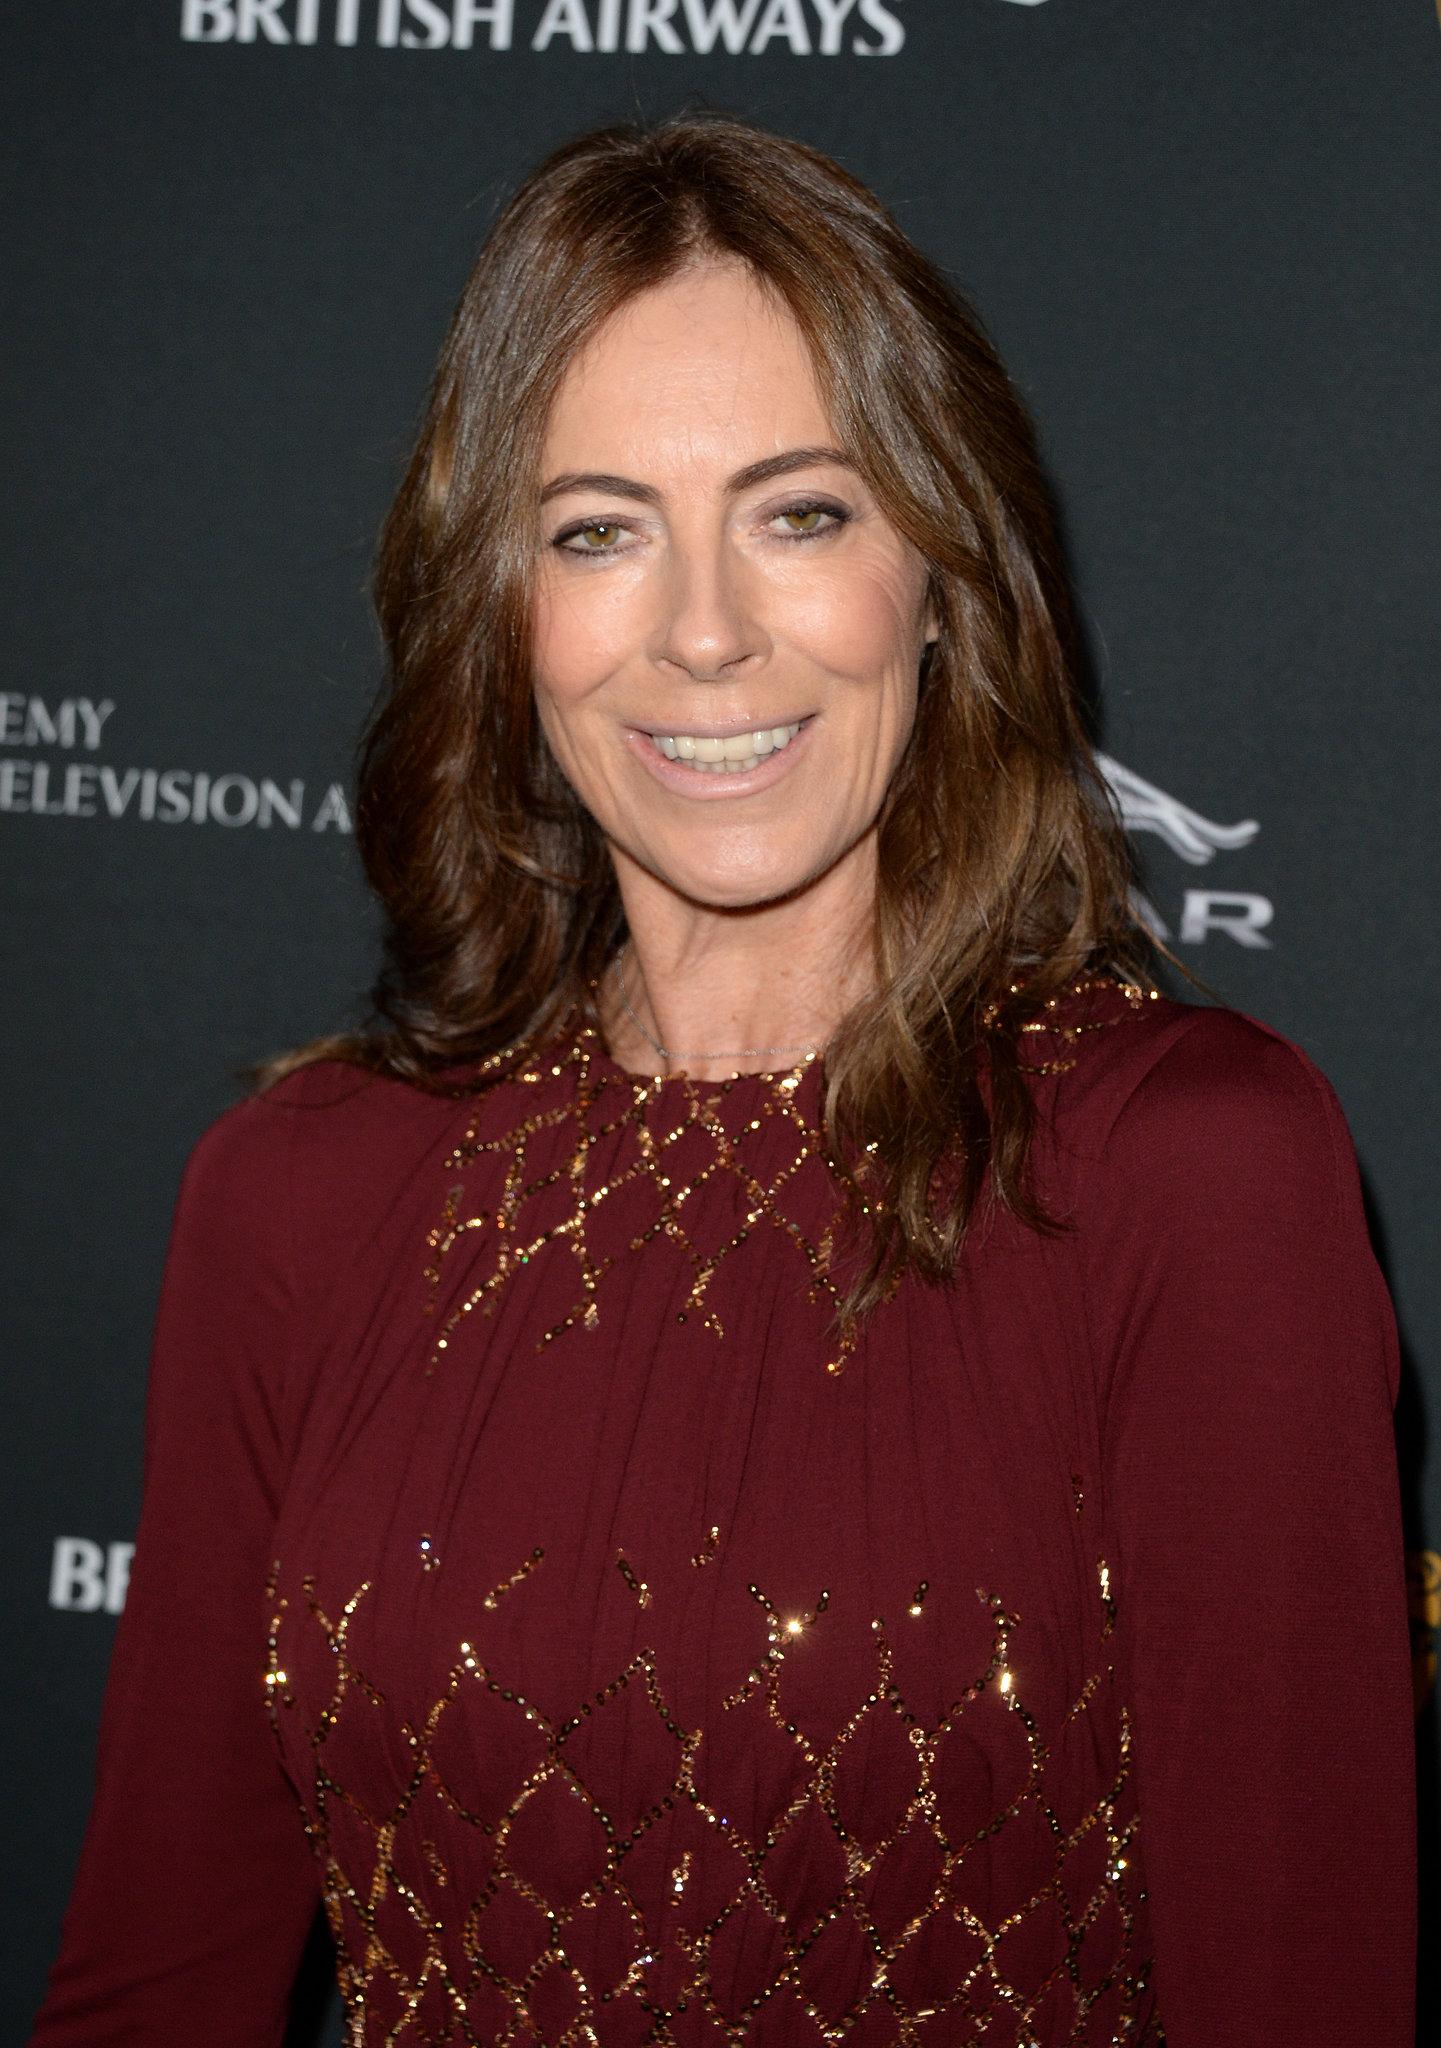 Kathryn Bigelow attended the BAFTA LA Jaguar Britannia Awards.